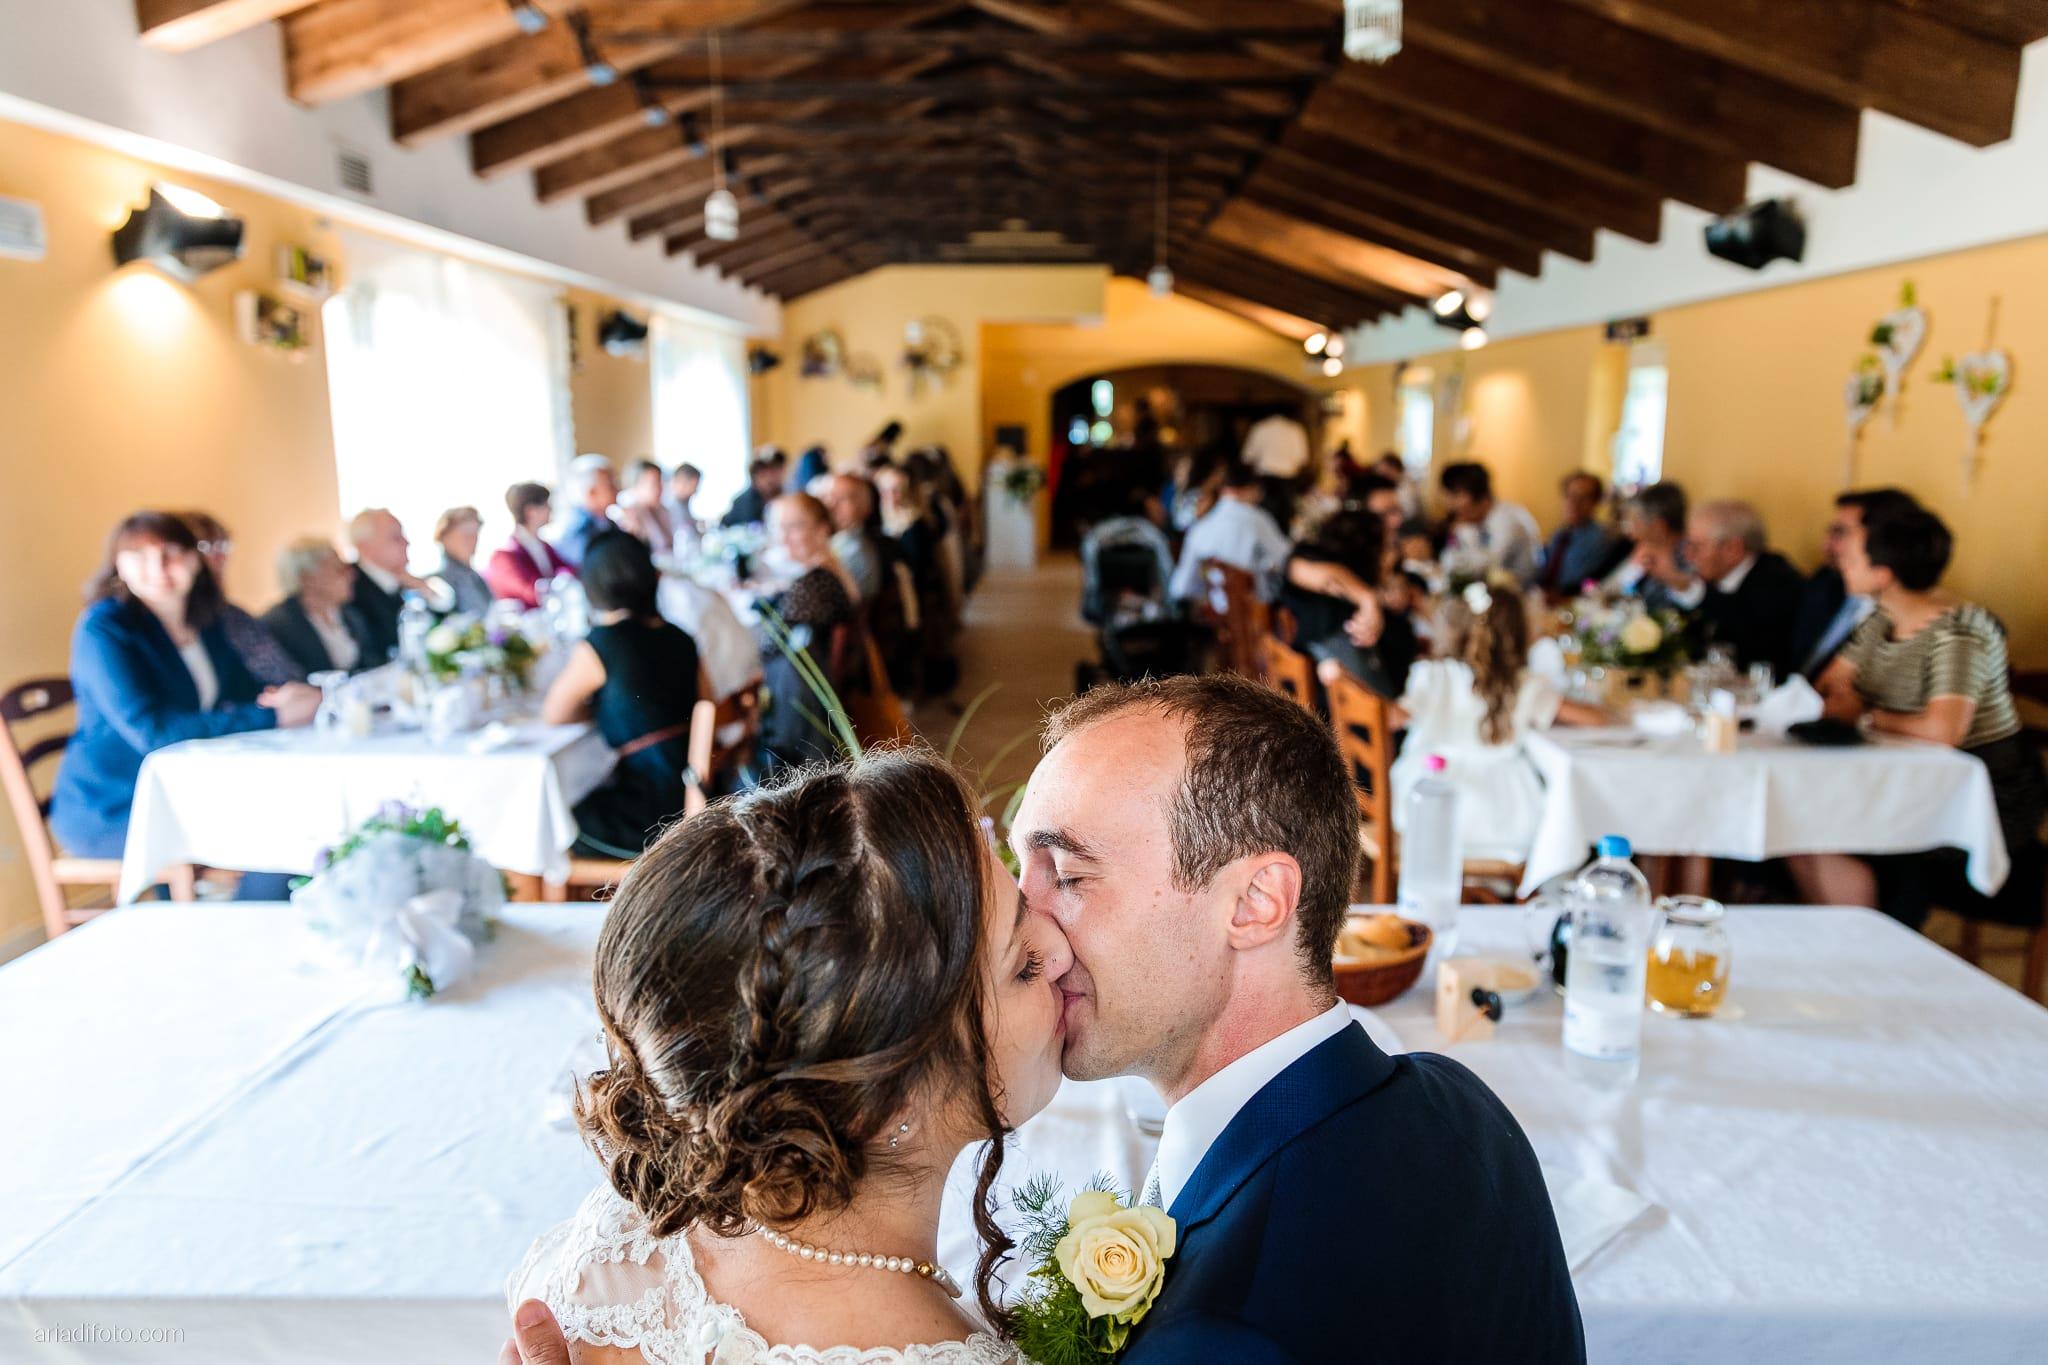 Maria Emanuela Fabio Matrimonio Muggia Porto Vecchio Agriturismo Hermada Duino Trieste ricevimento momenti